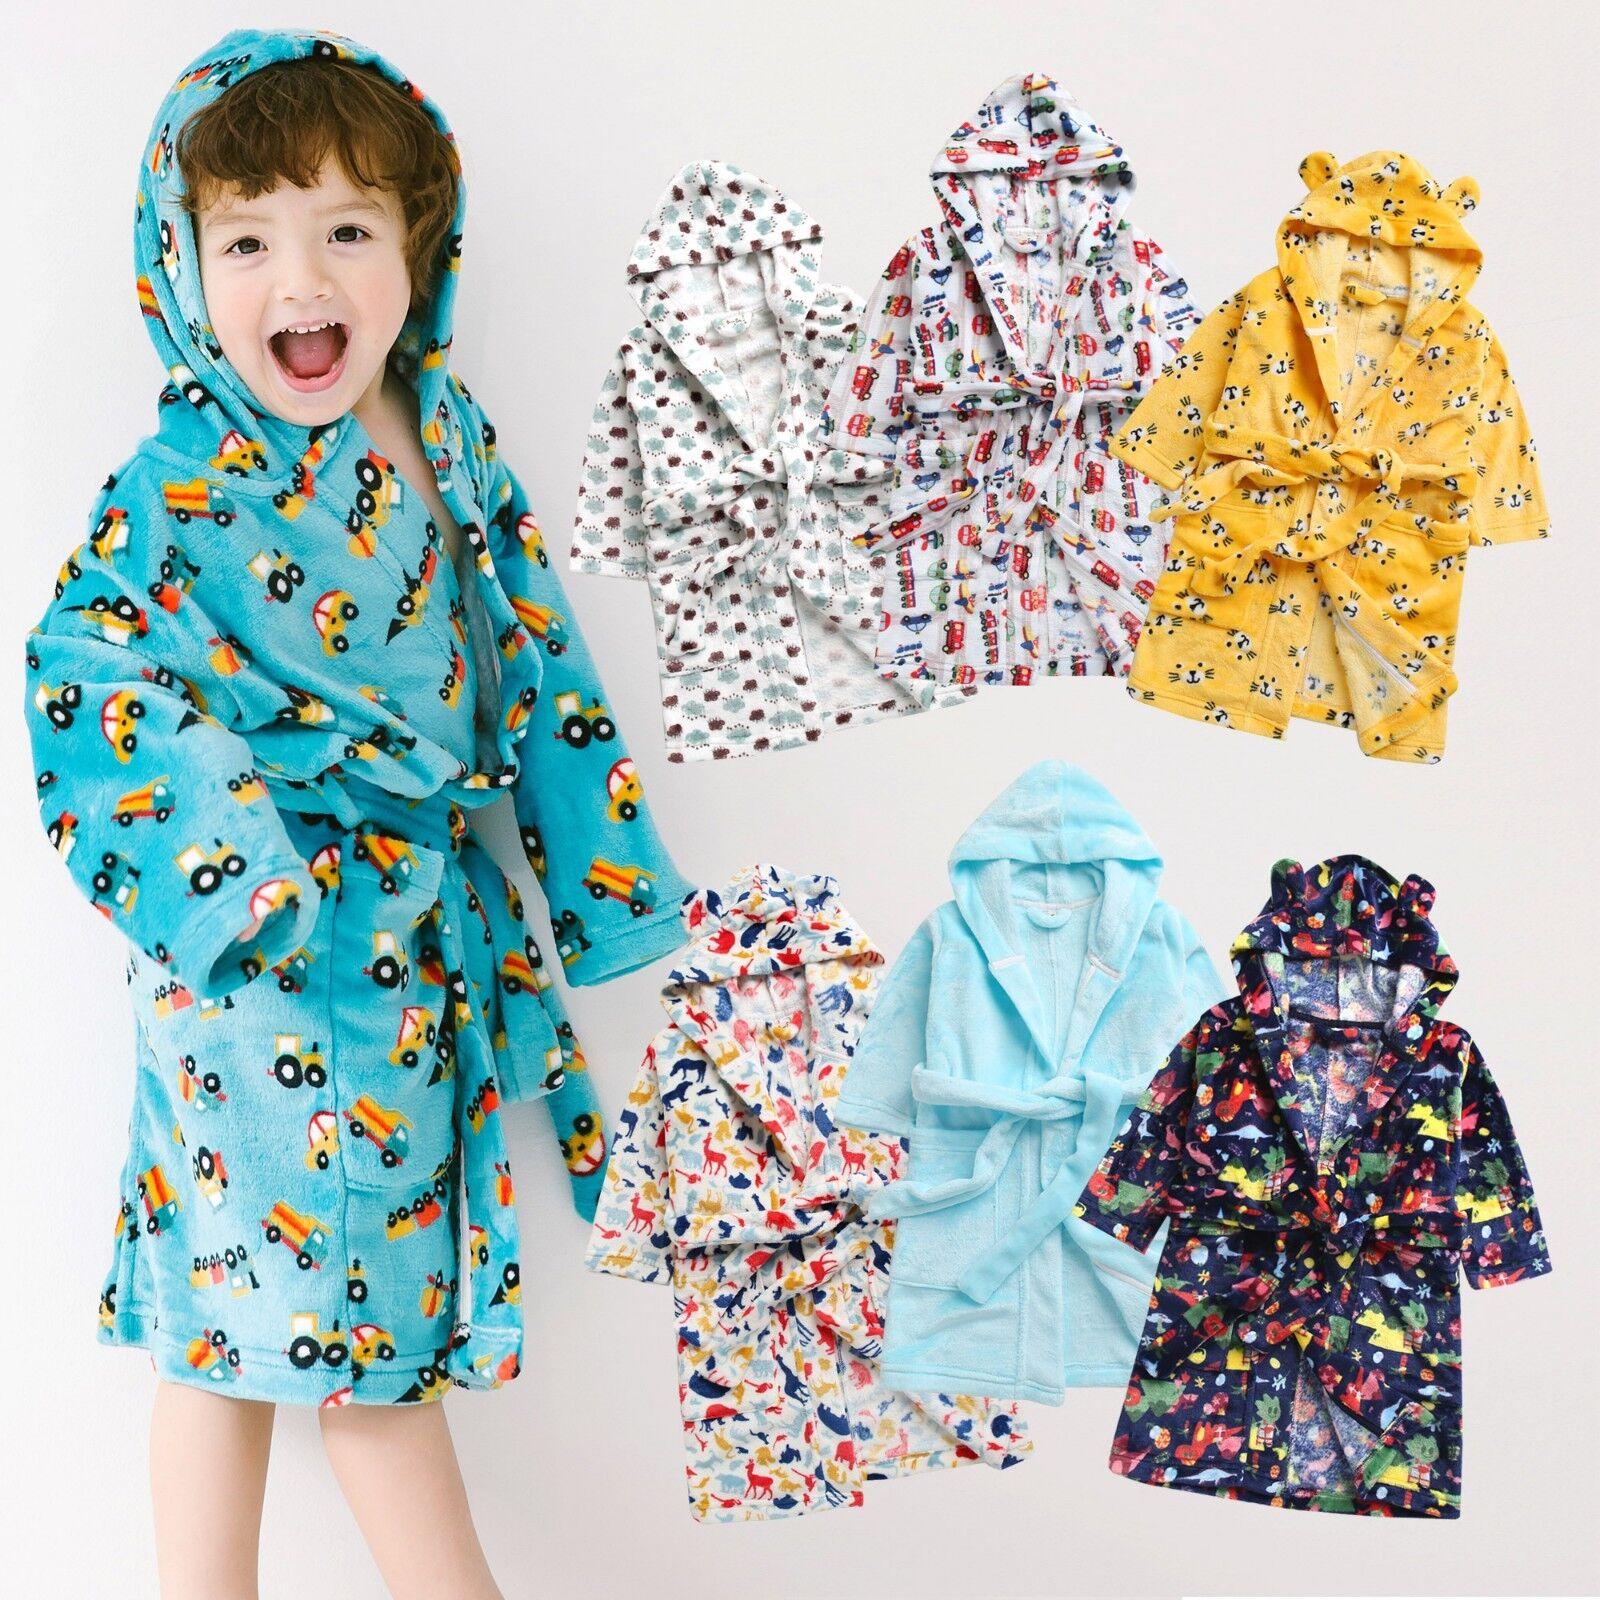 Vaenait Baby Kids Soft Plush Hooded Bathrobes Dressing Gowns